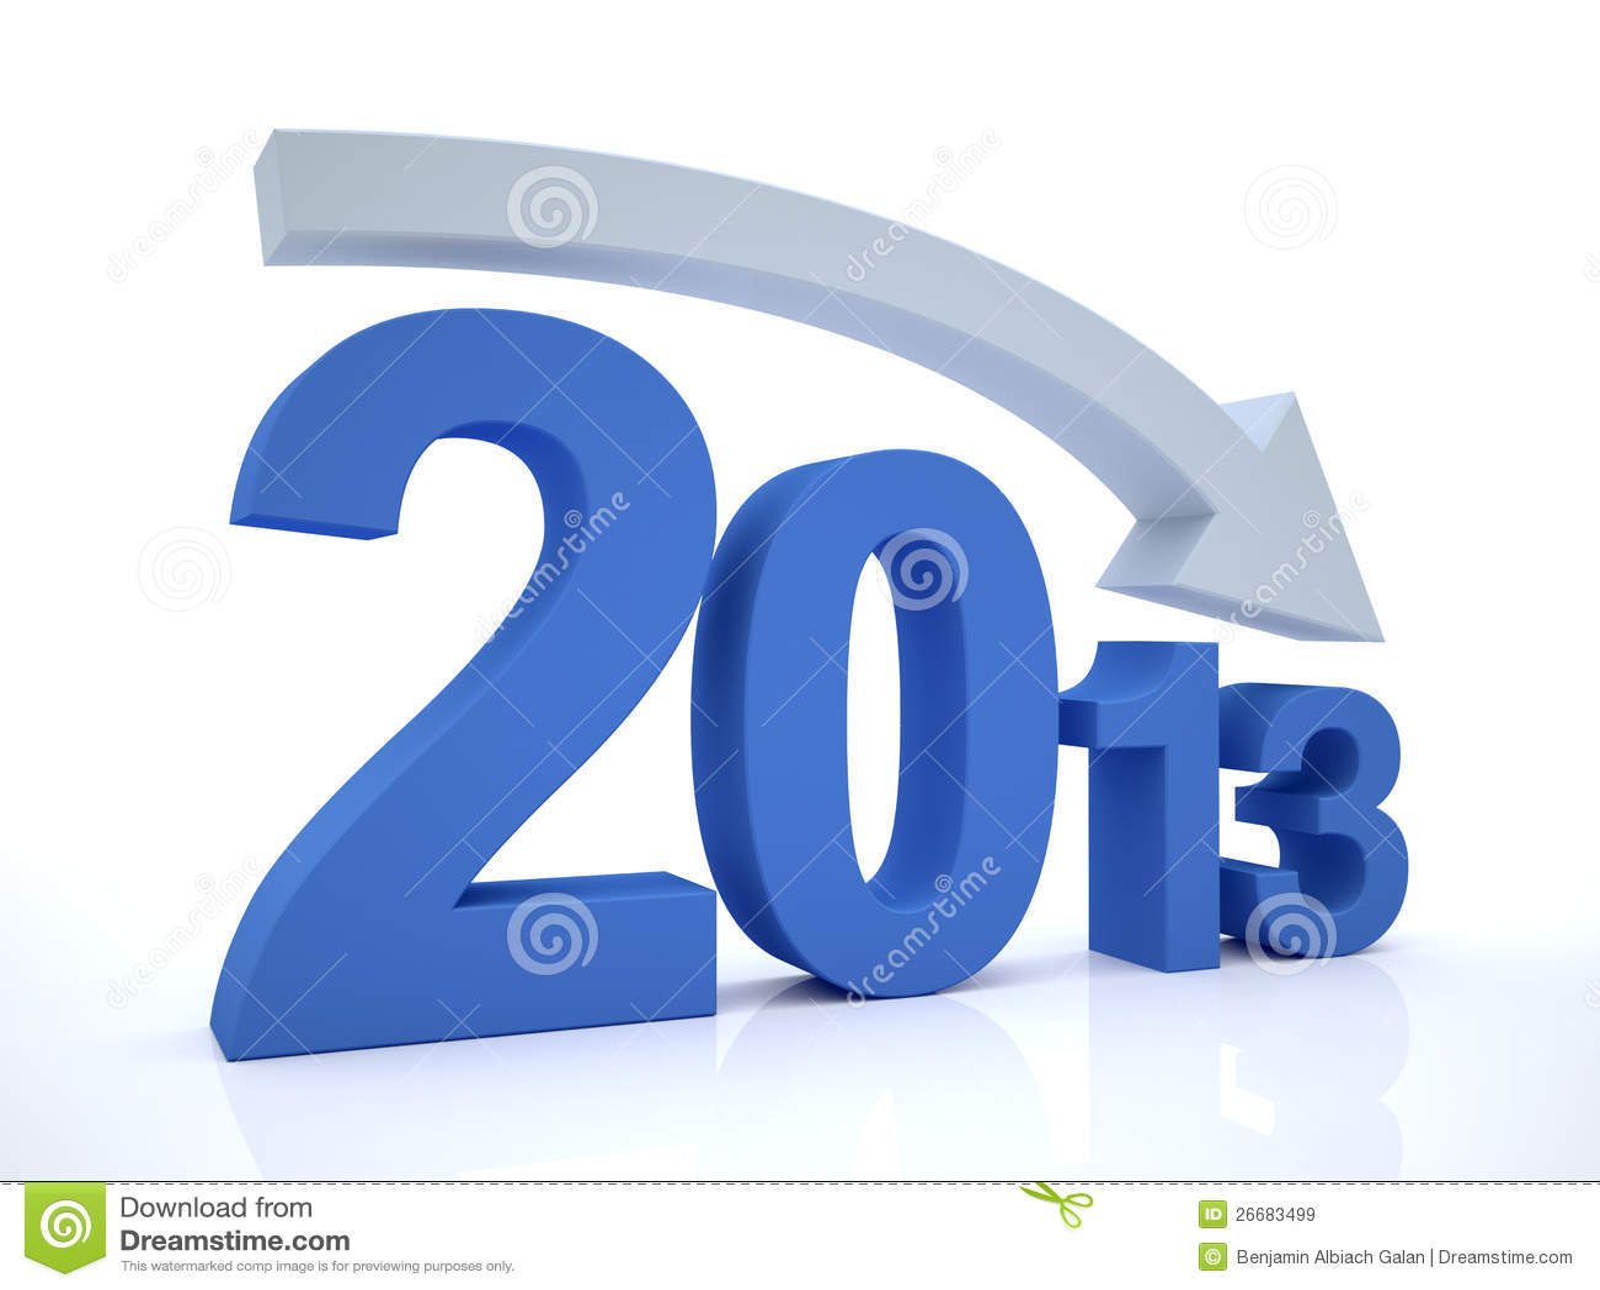 Royalty Free Stock Images  Decrease 2012 With ArrowDecrease Arrow